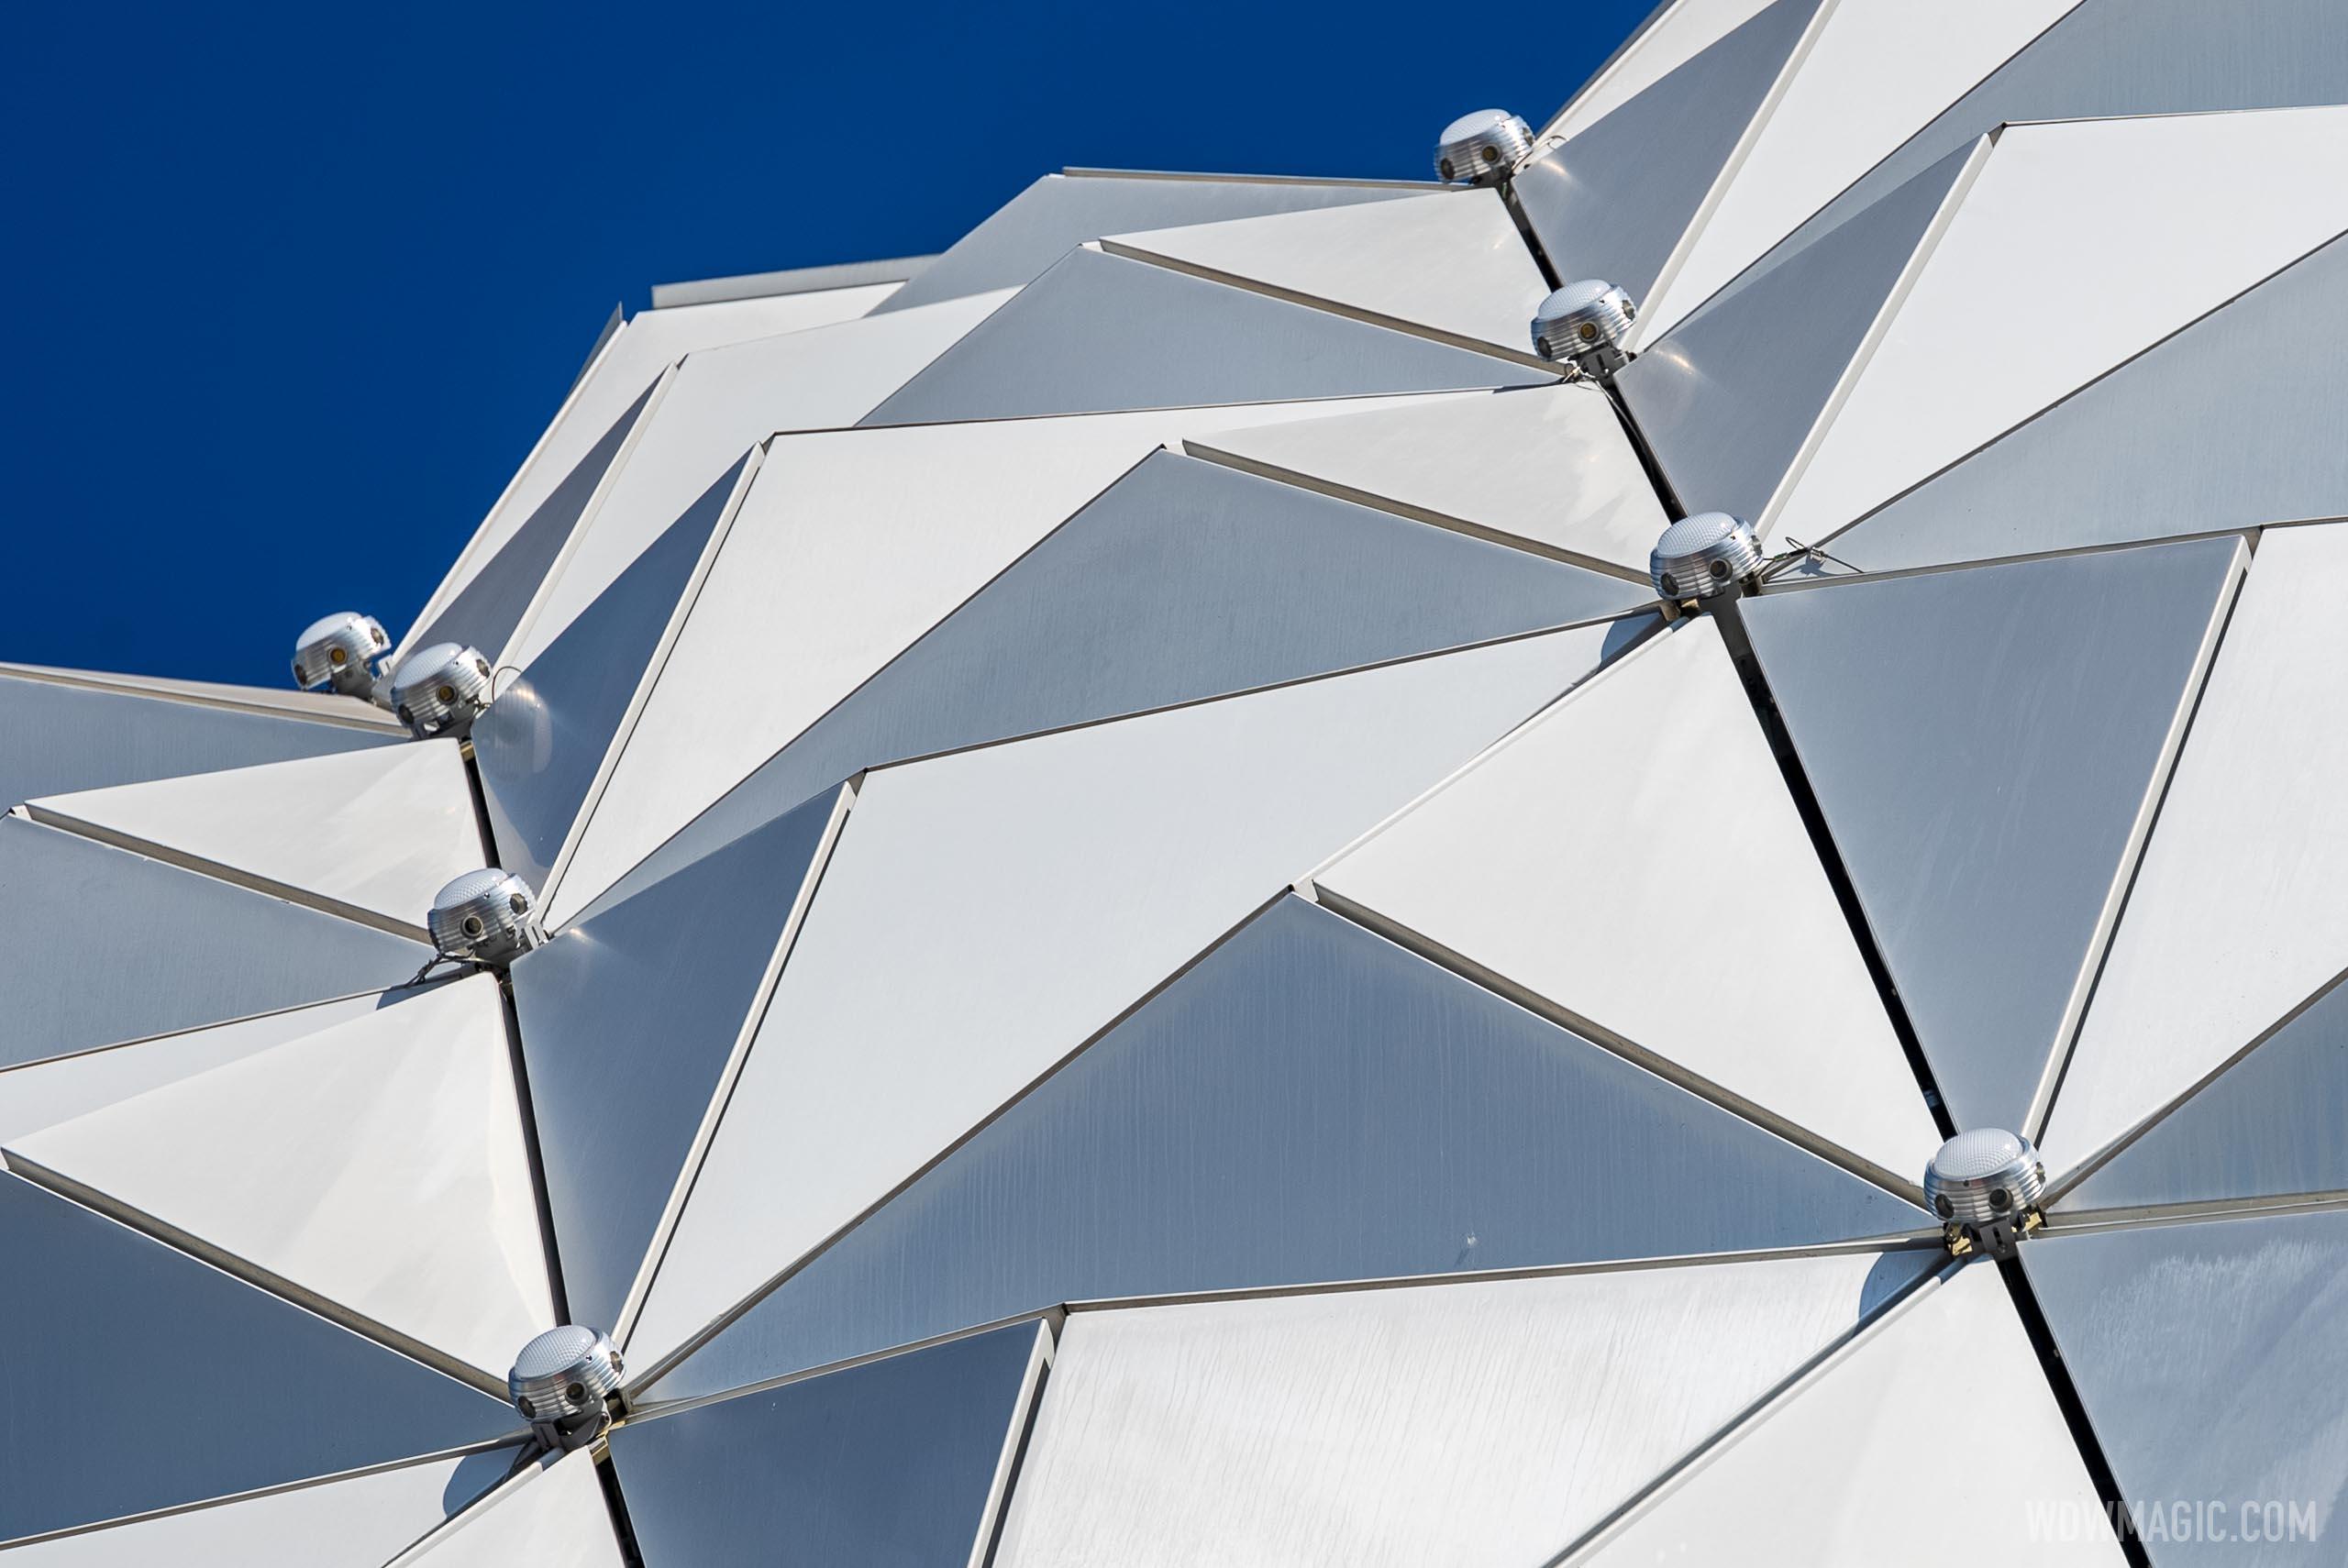 Spaceship-Earth_Full_41669.jpg